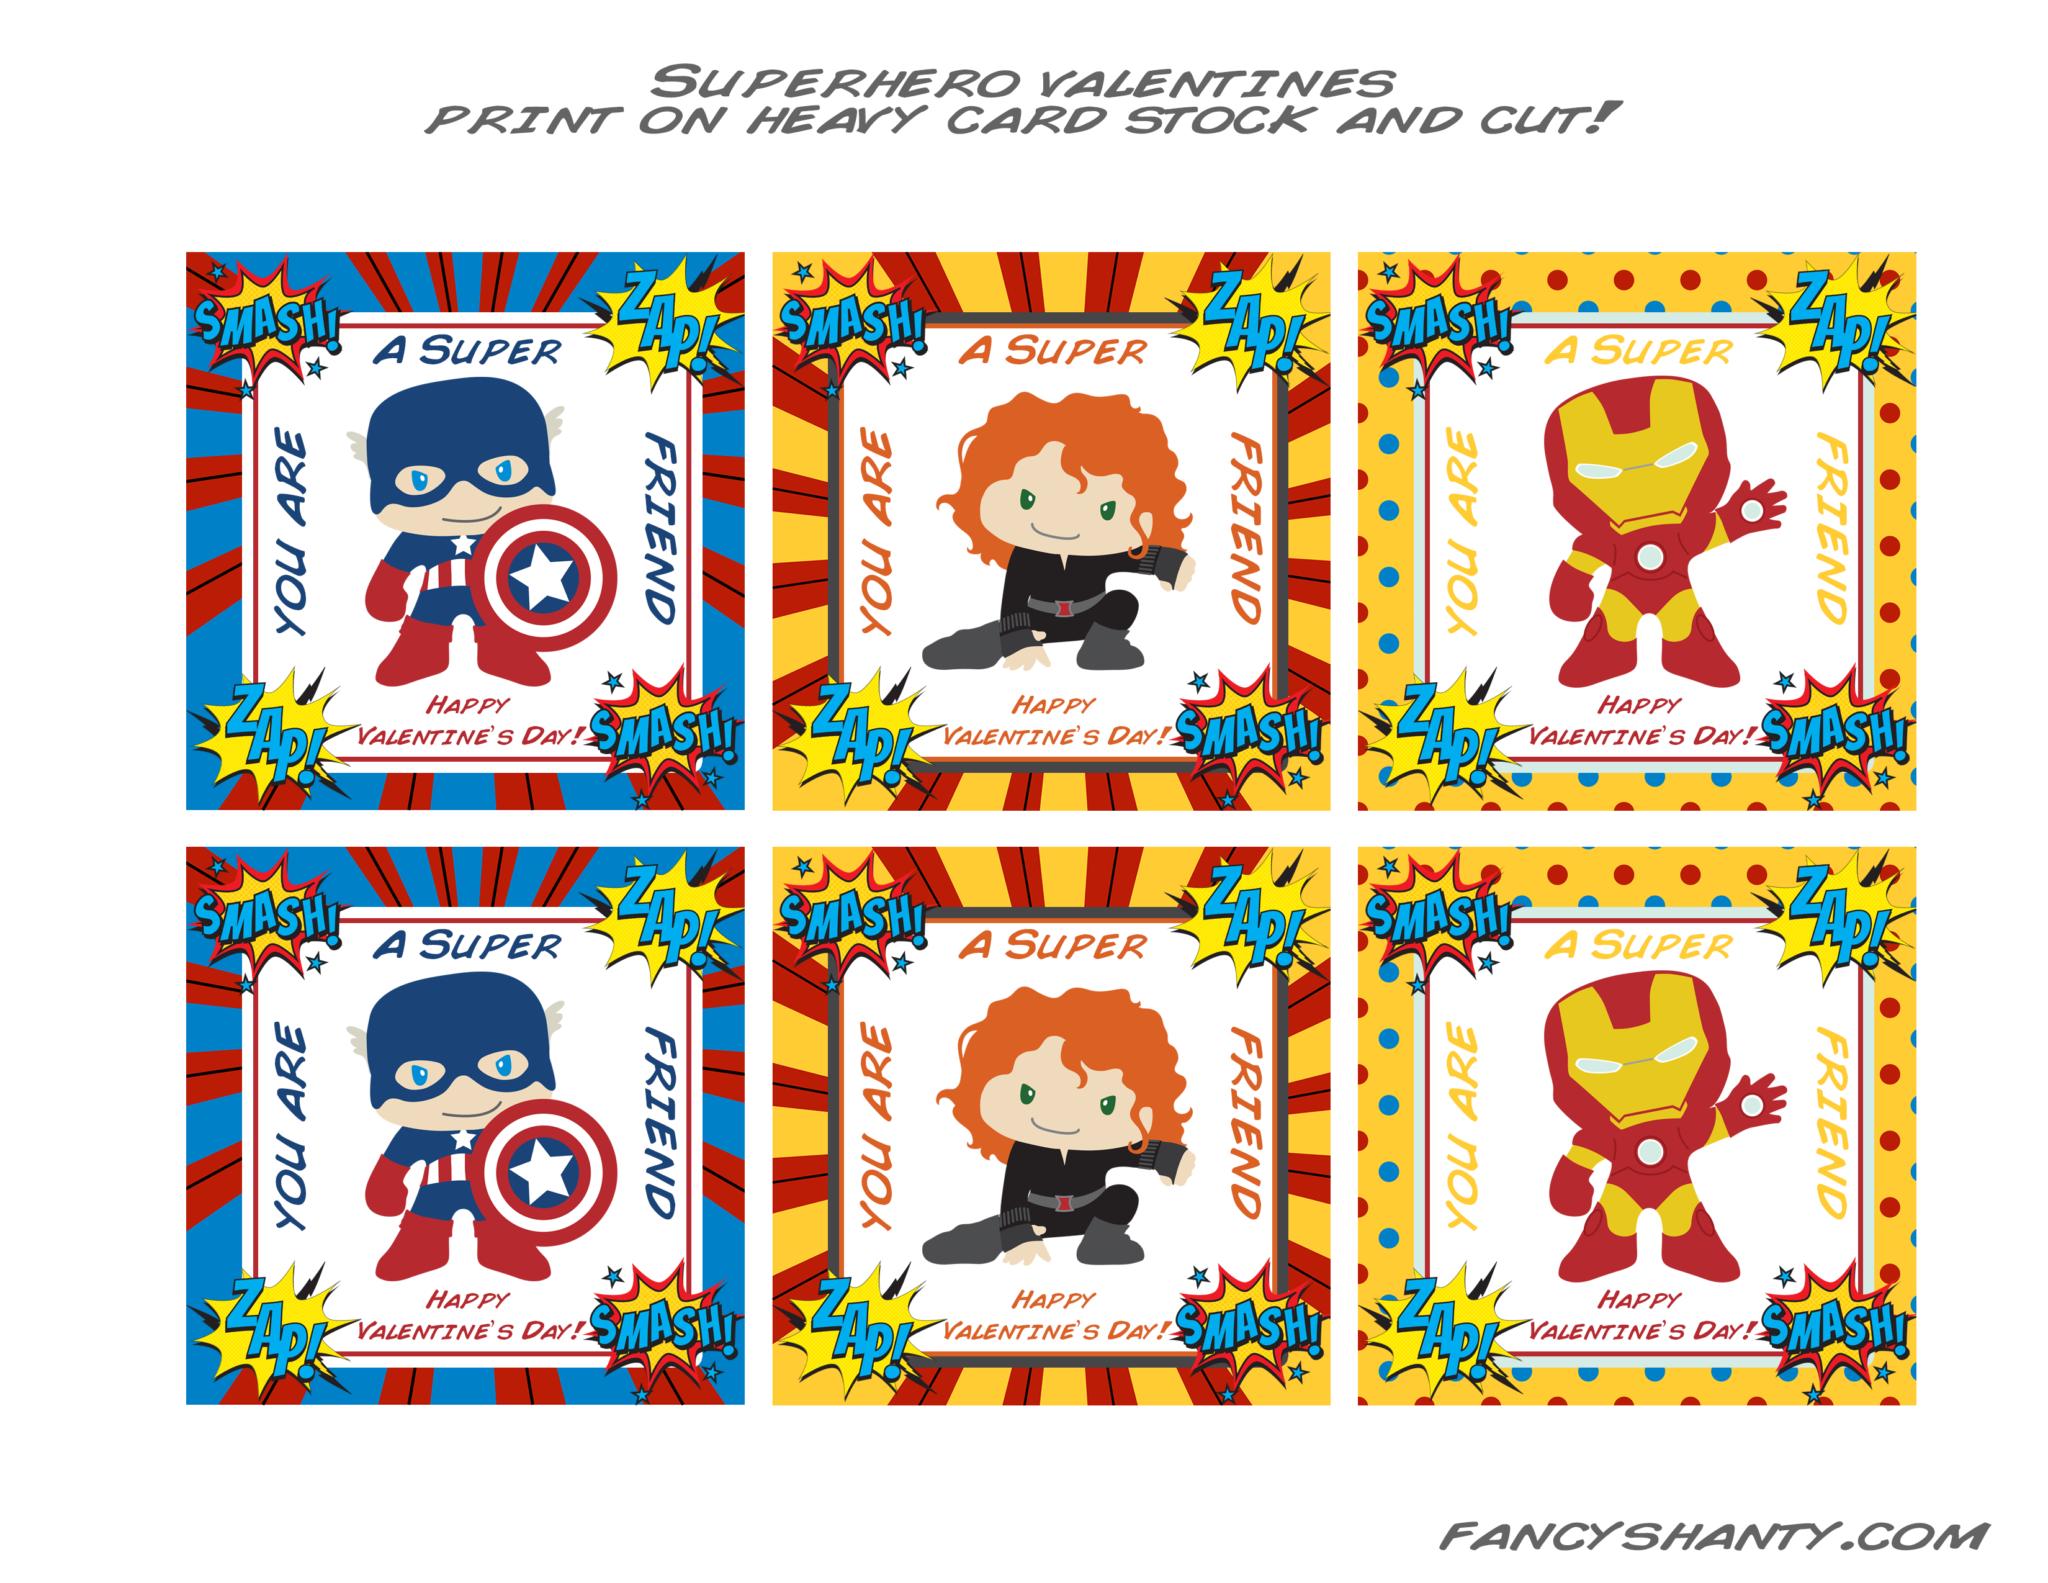 Superhero Valentine Cards